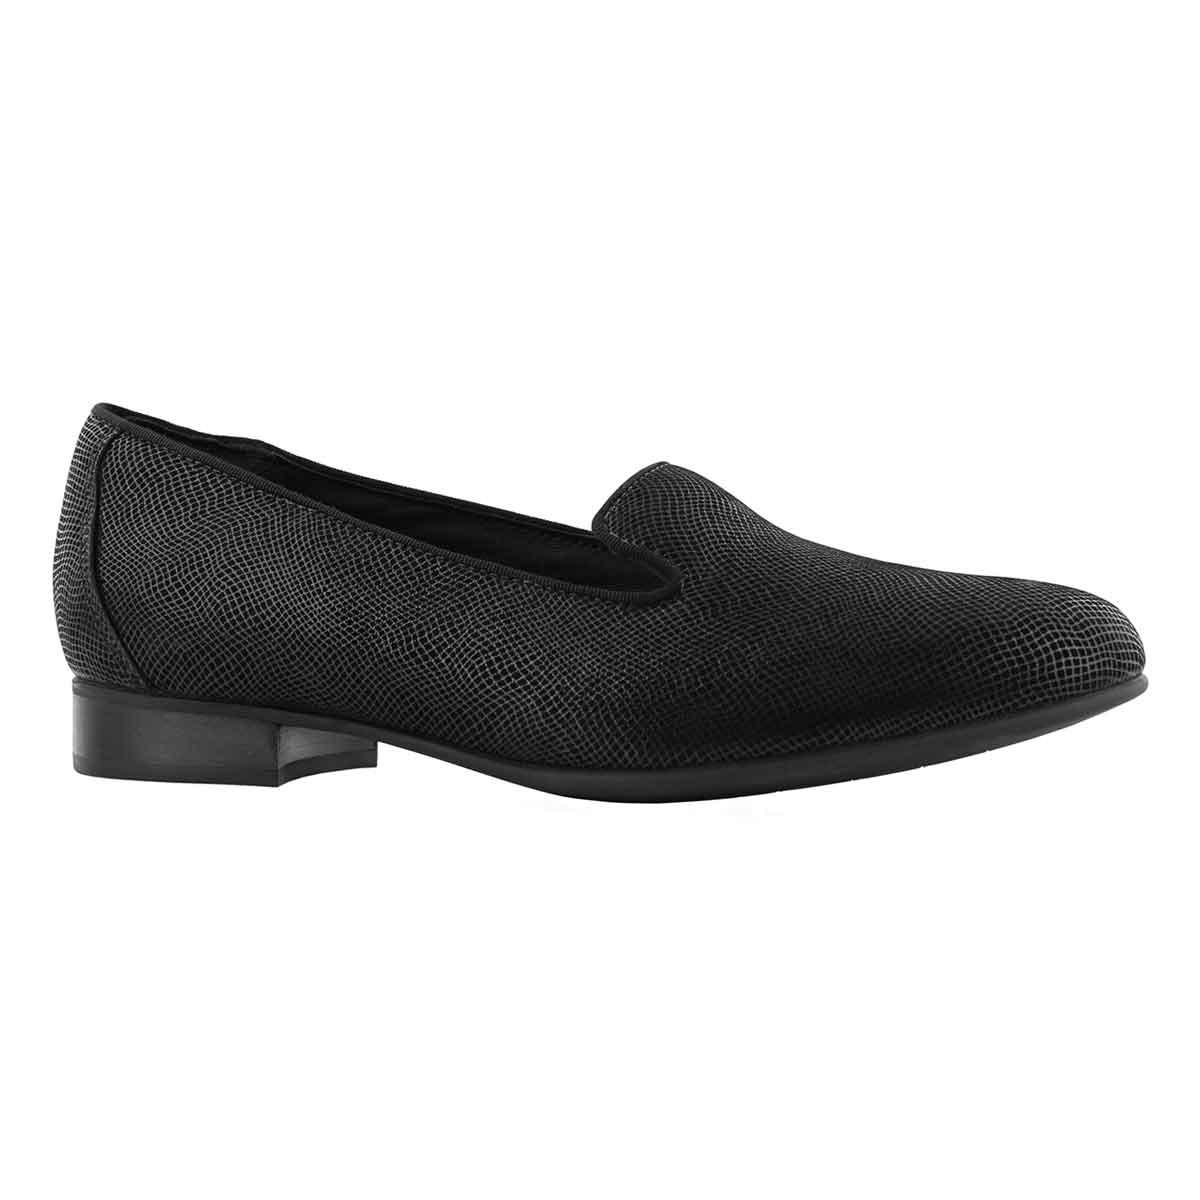 Lds Un Blush Step black dress loafer